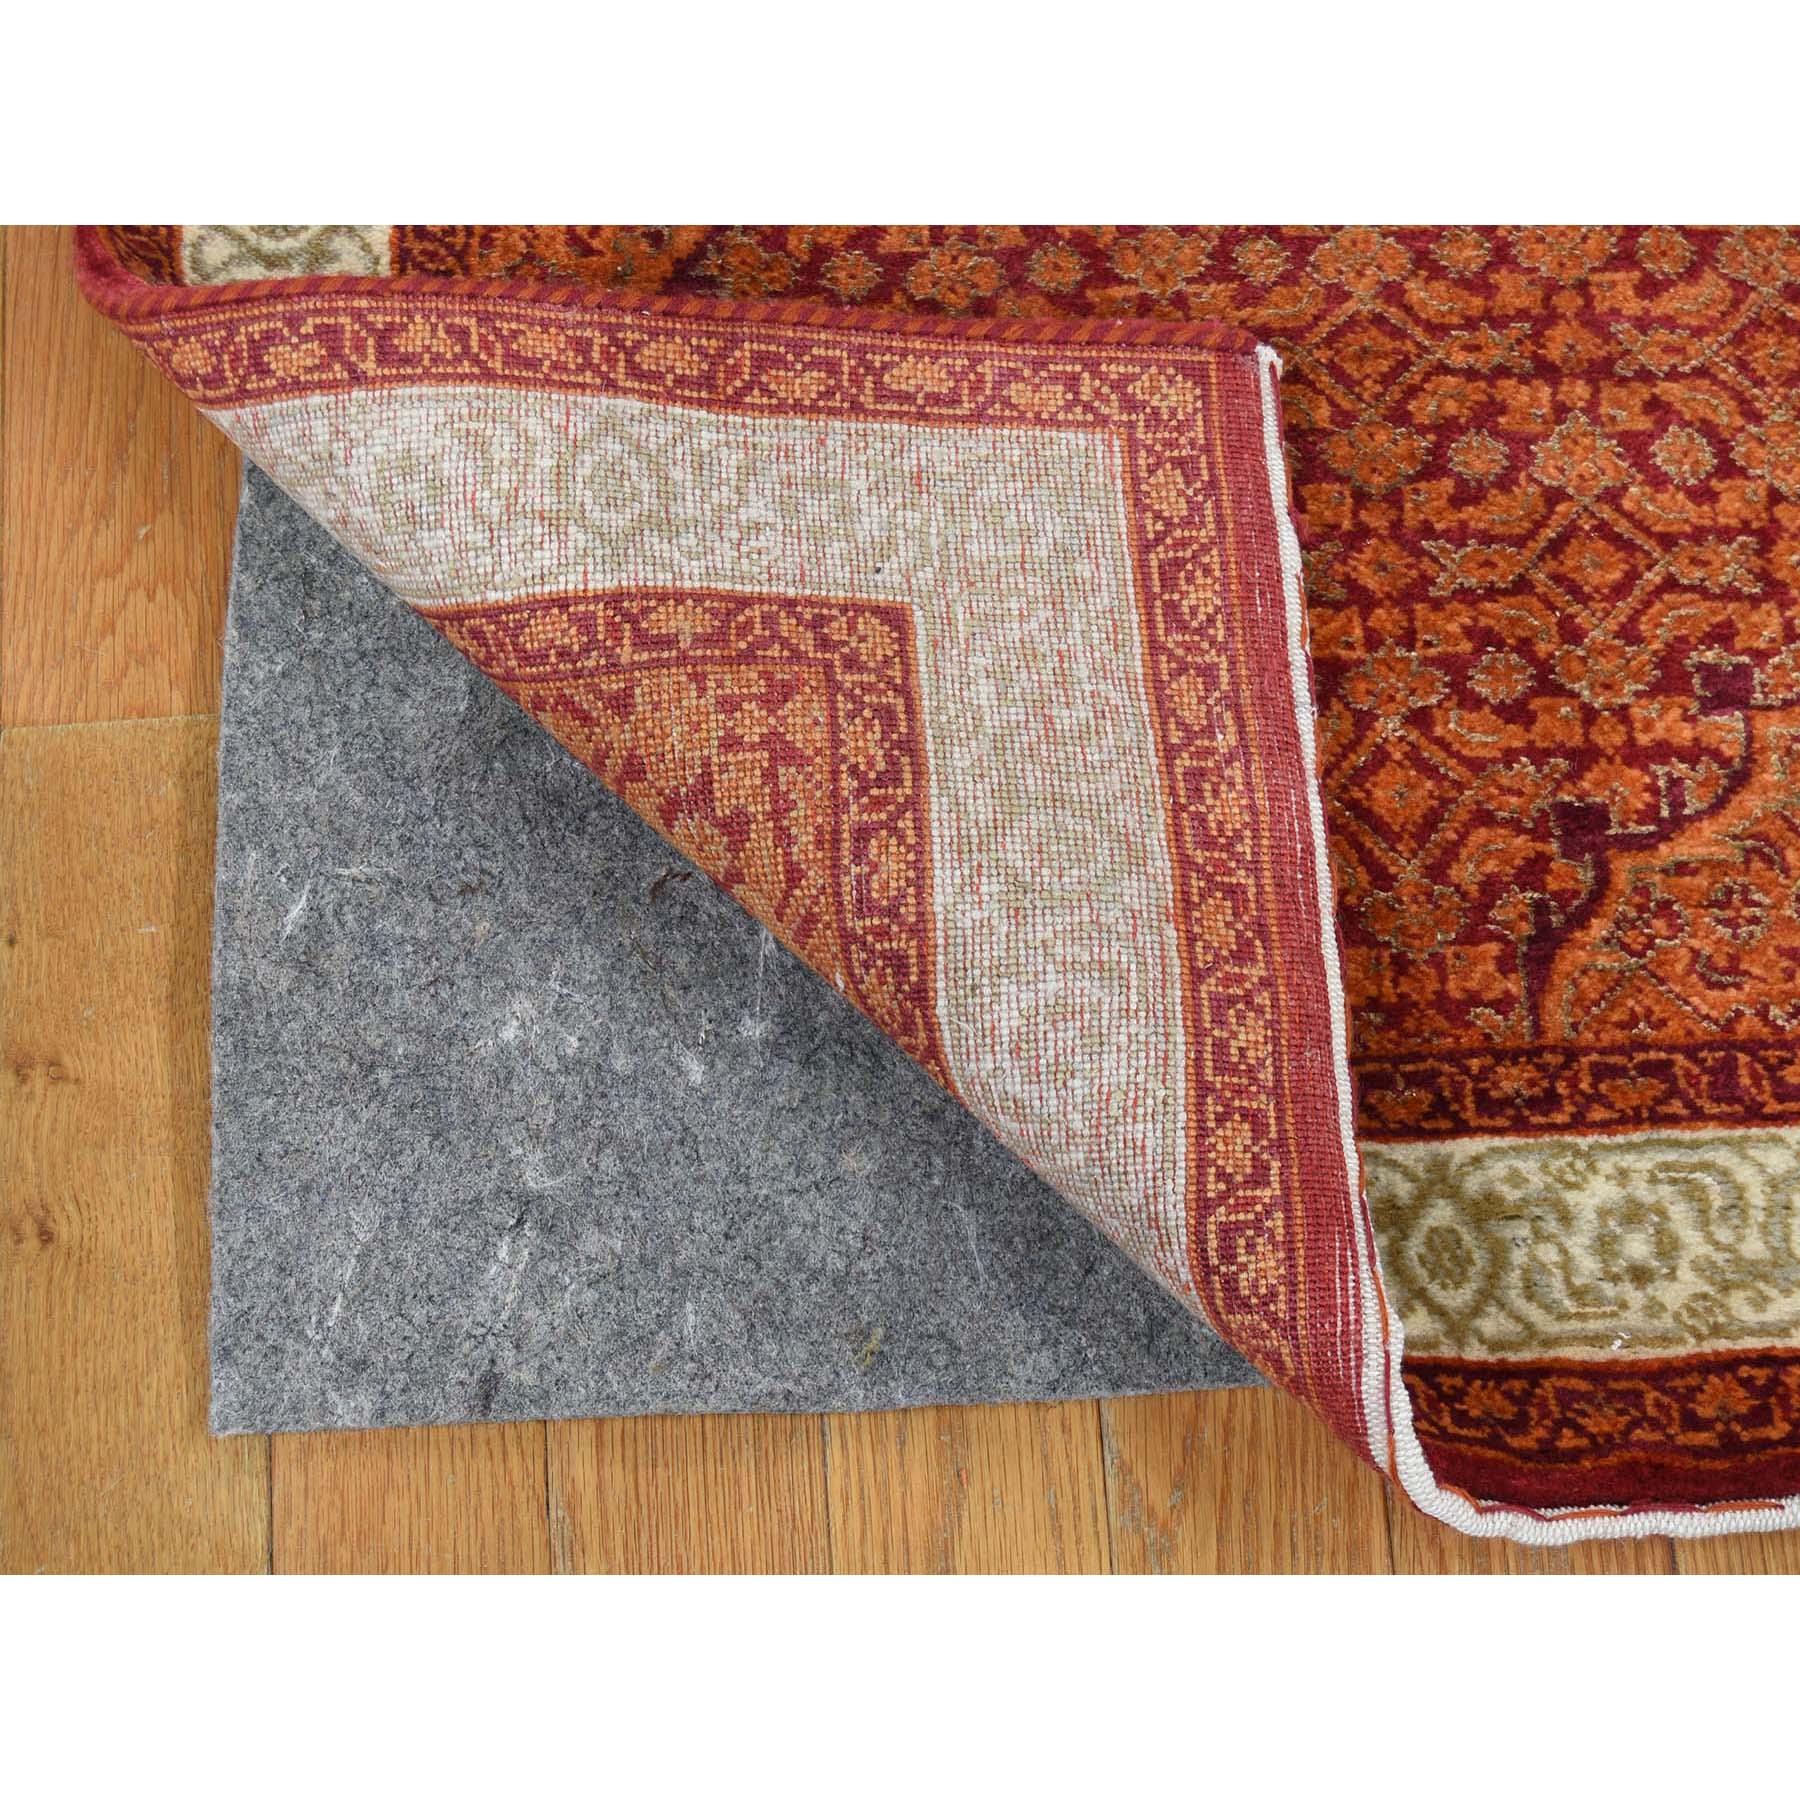 2-9 x13-10  Tabriz XL Runner Wool And Silk Hand Knotted Oriental Rug